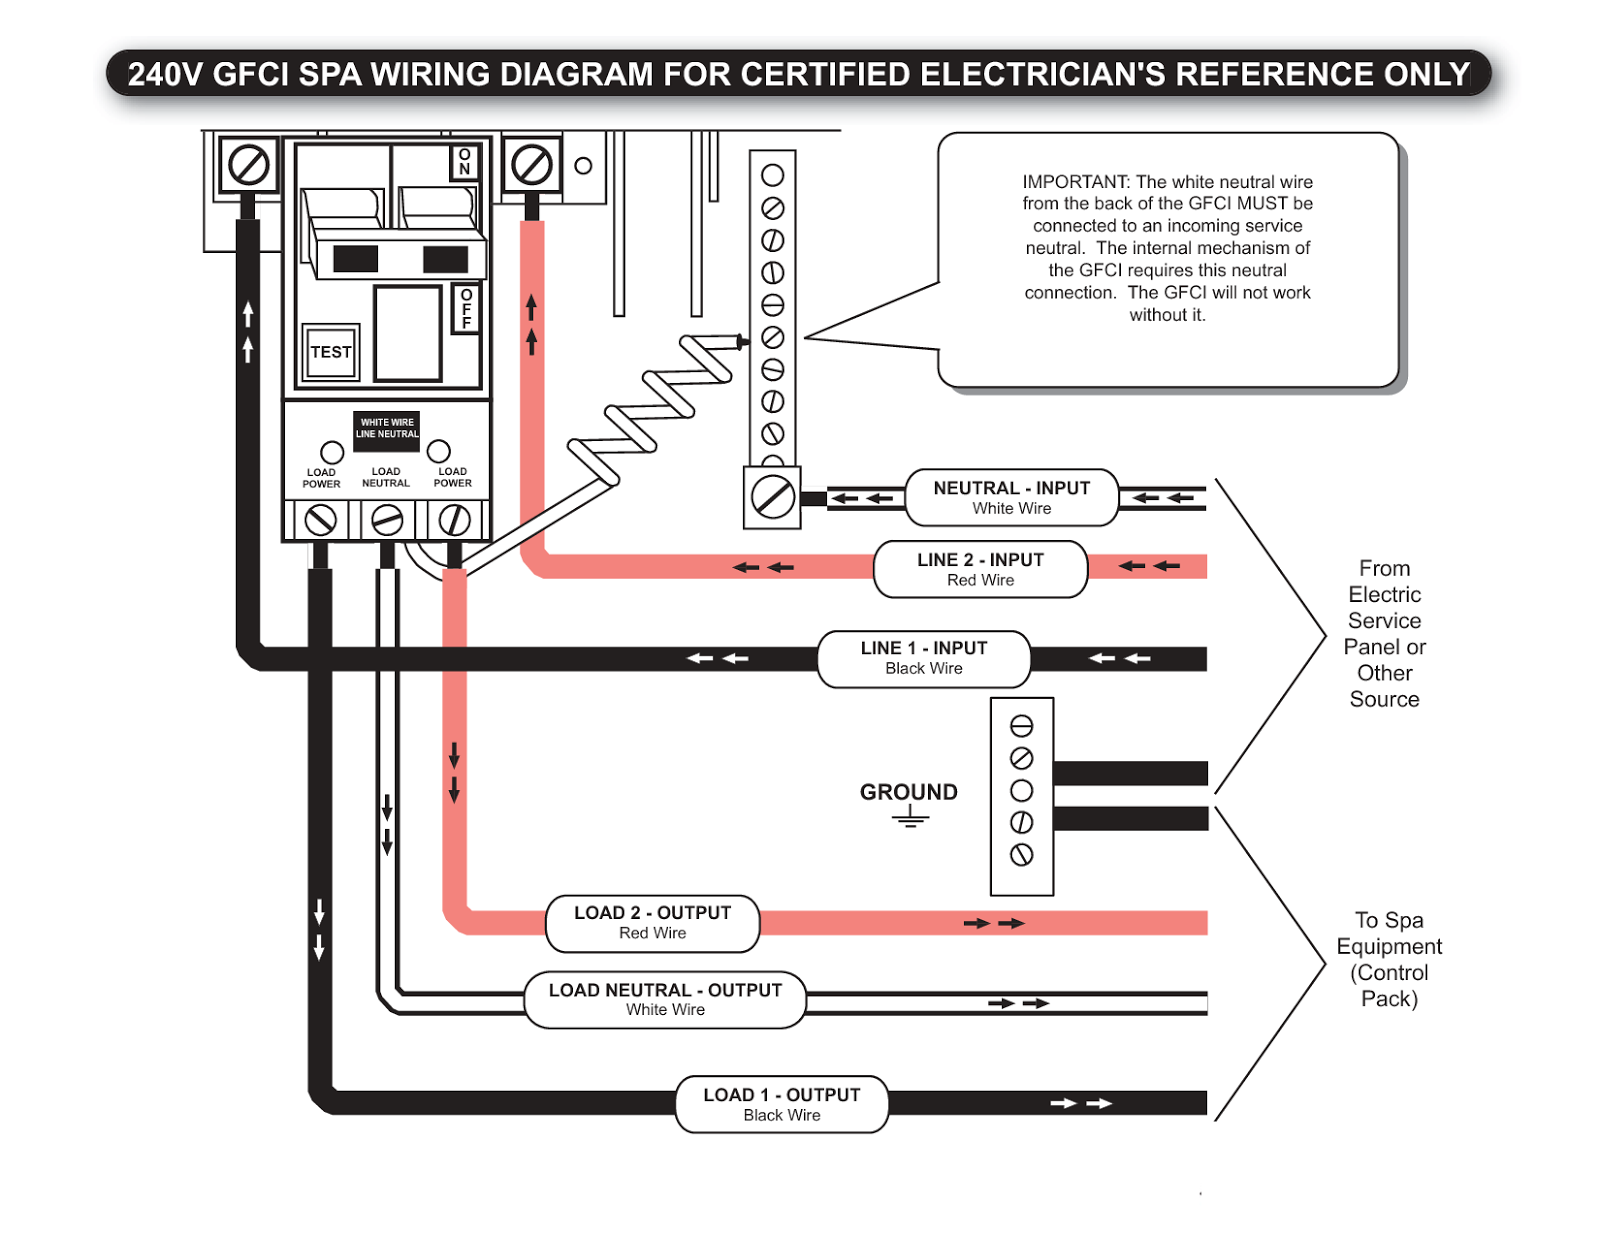 Electric Work  Gfci Wiring Diagram  240 Volt